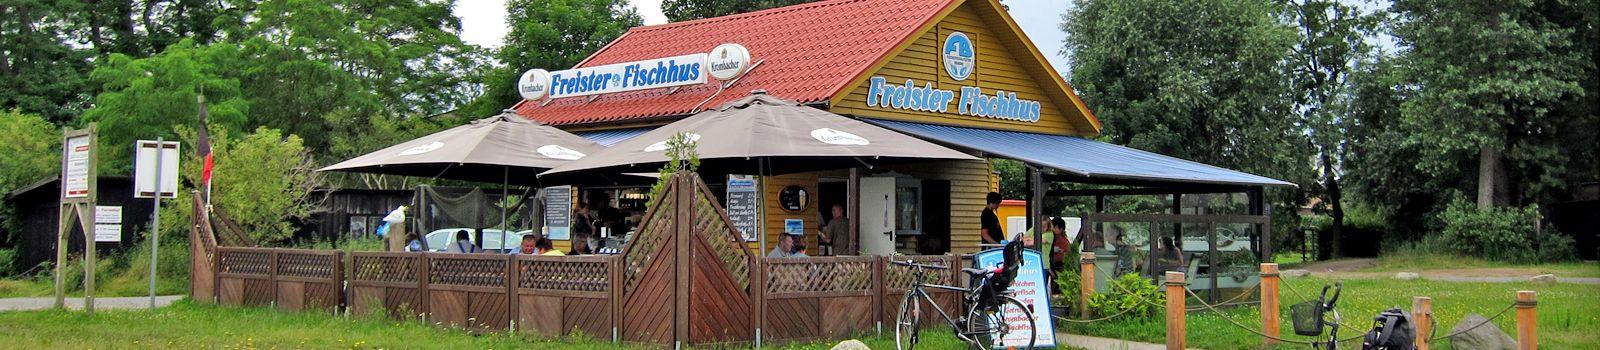 Freister Fischhus